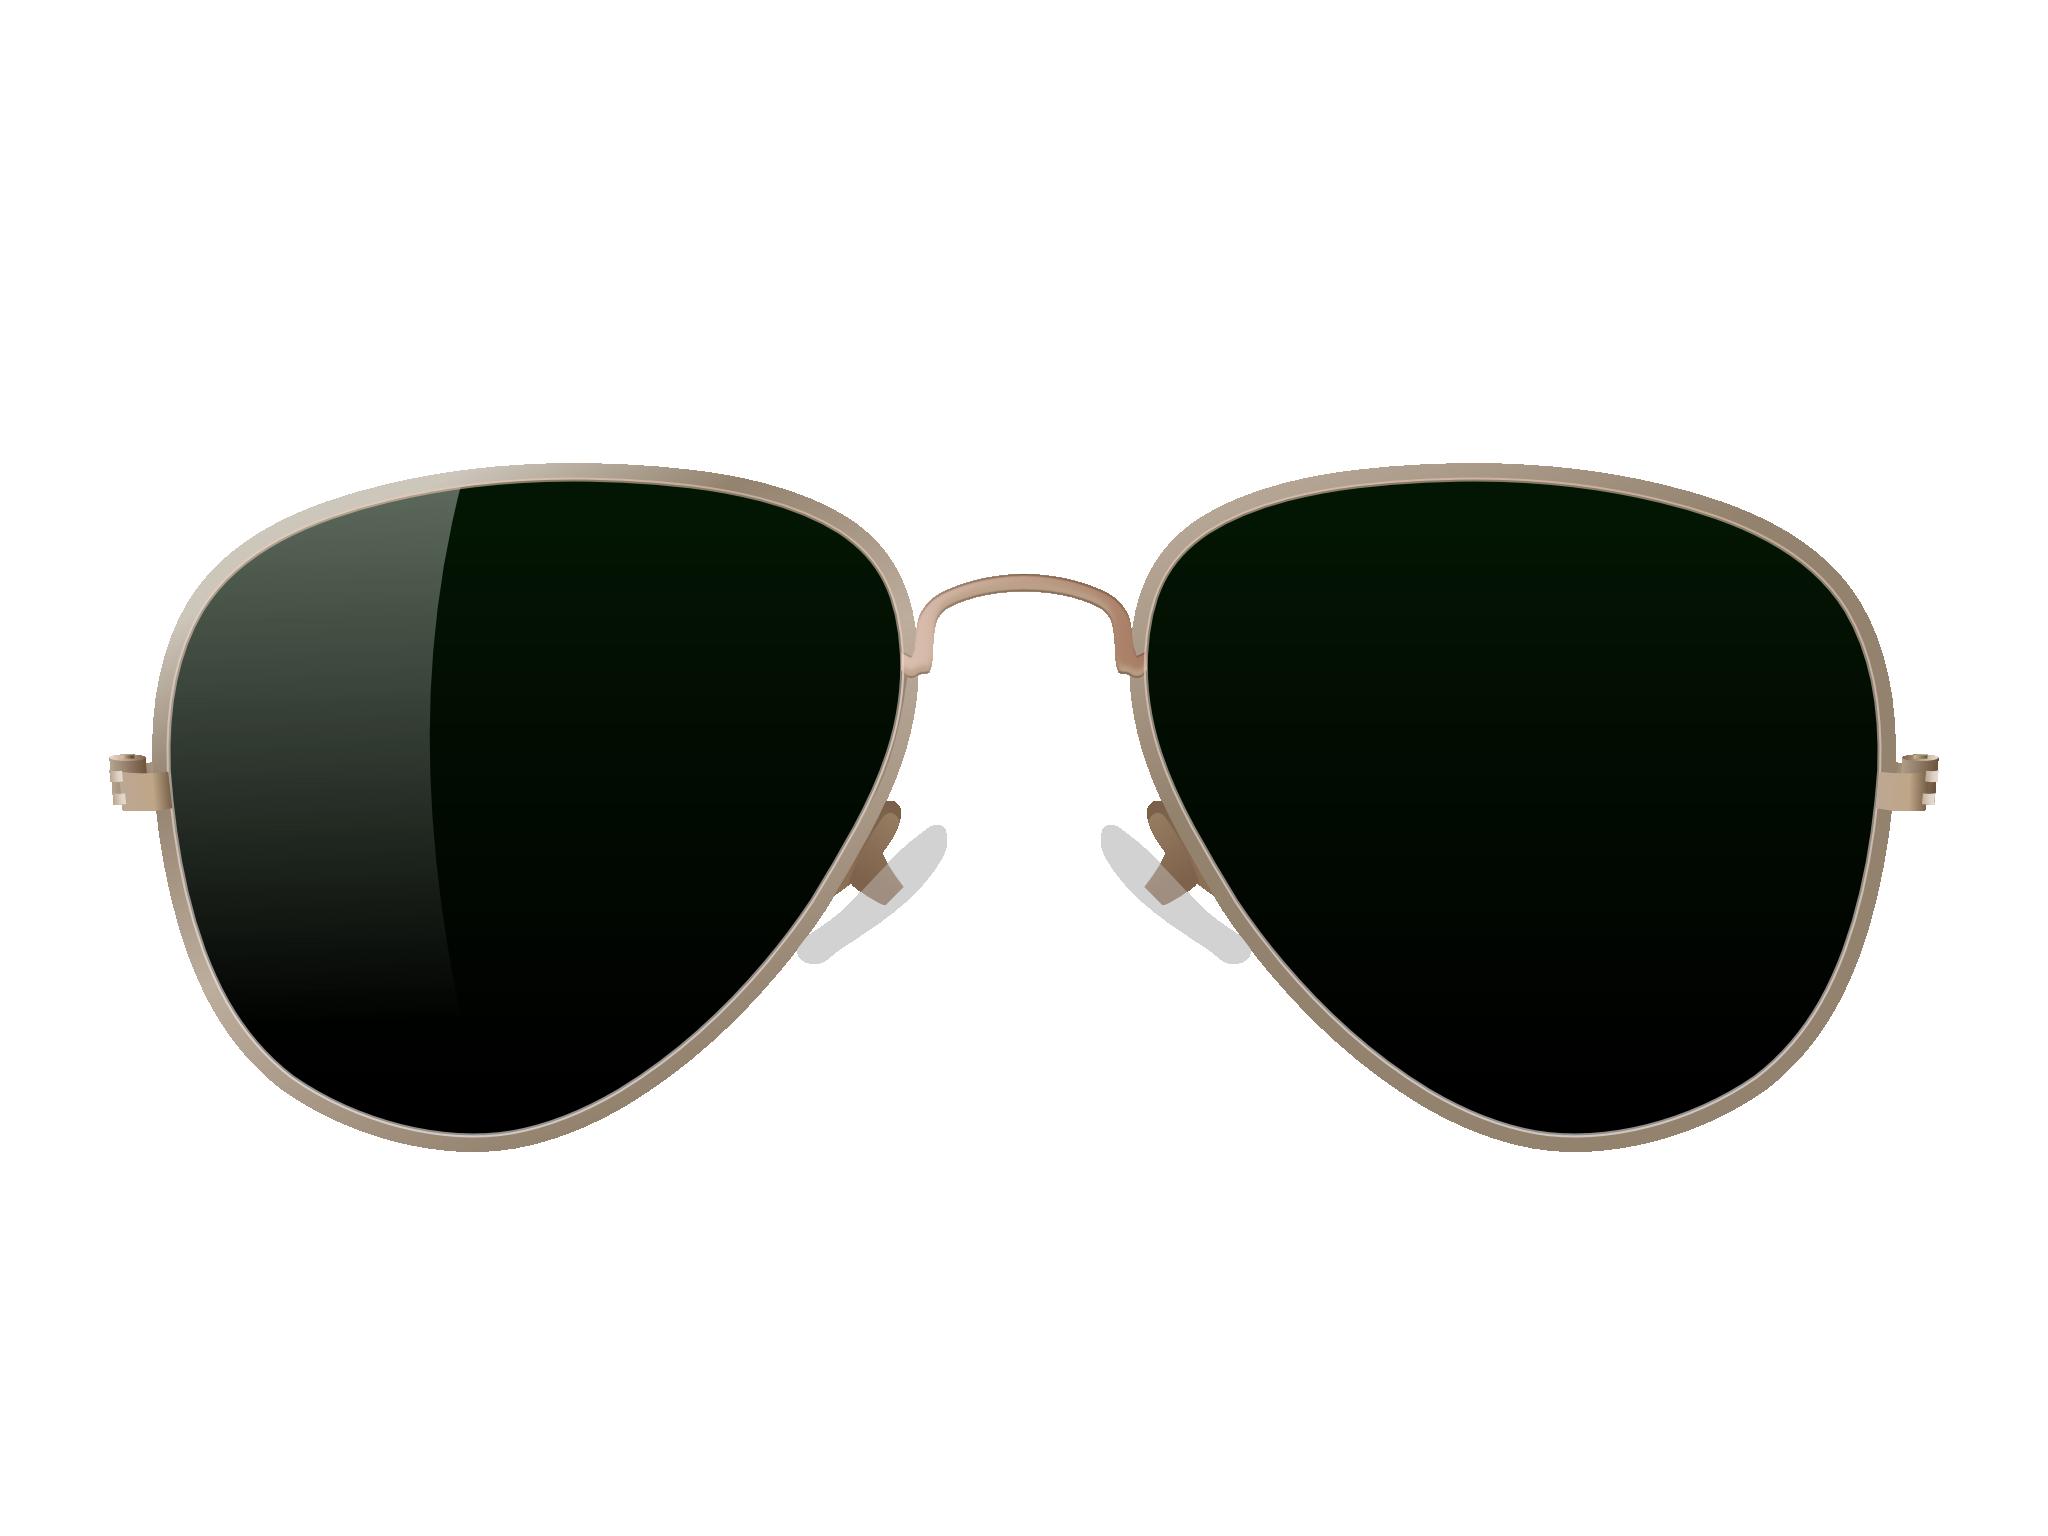 Sunny clipart sunglasses rayban. Pin by maddy goyal